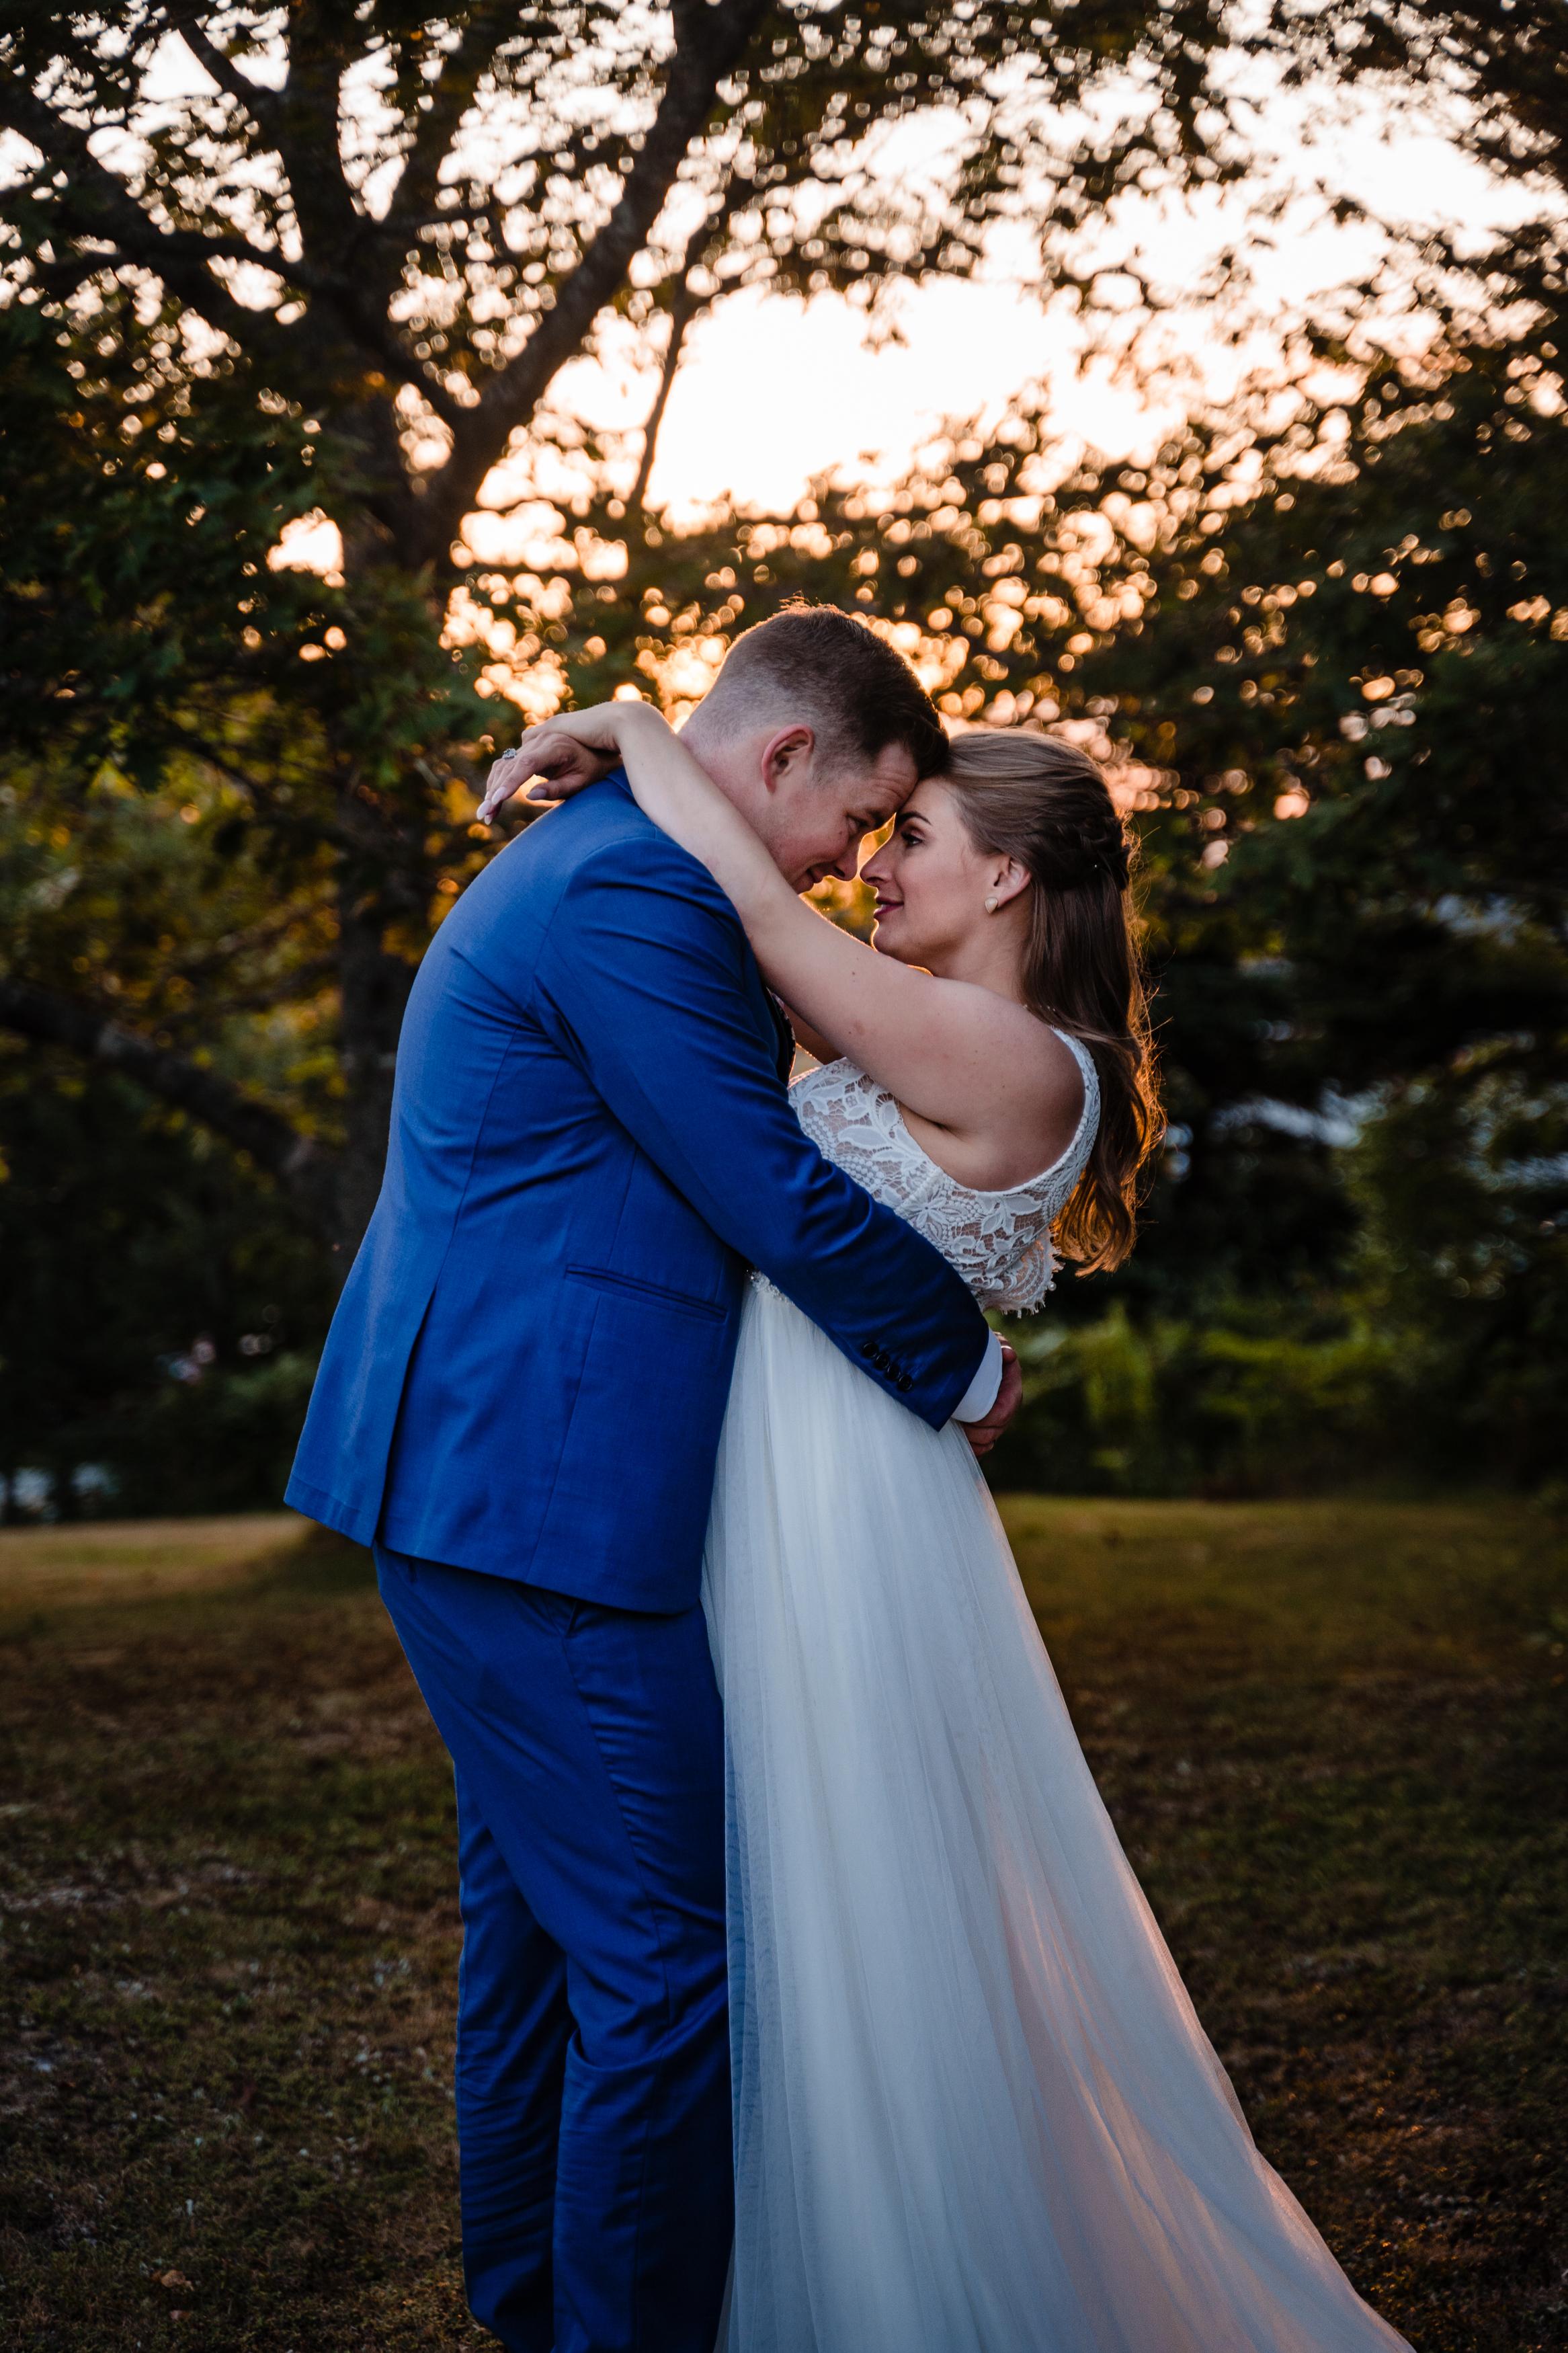 Janelle-Mitch-Halifax-Wedding-Nova-Scotia-Photography (144 of 163).jpg